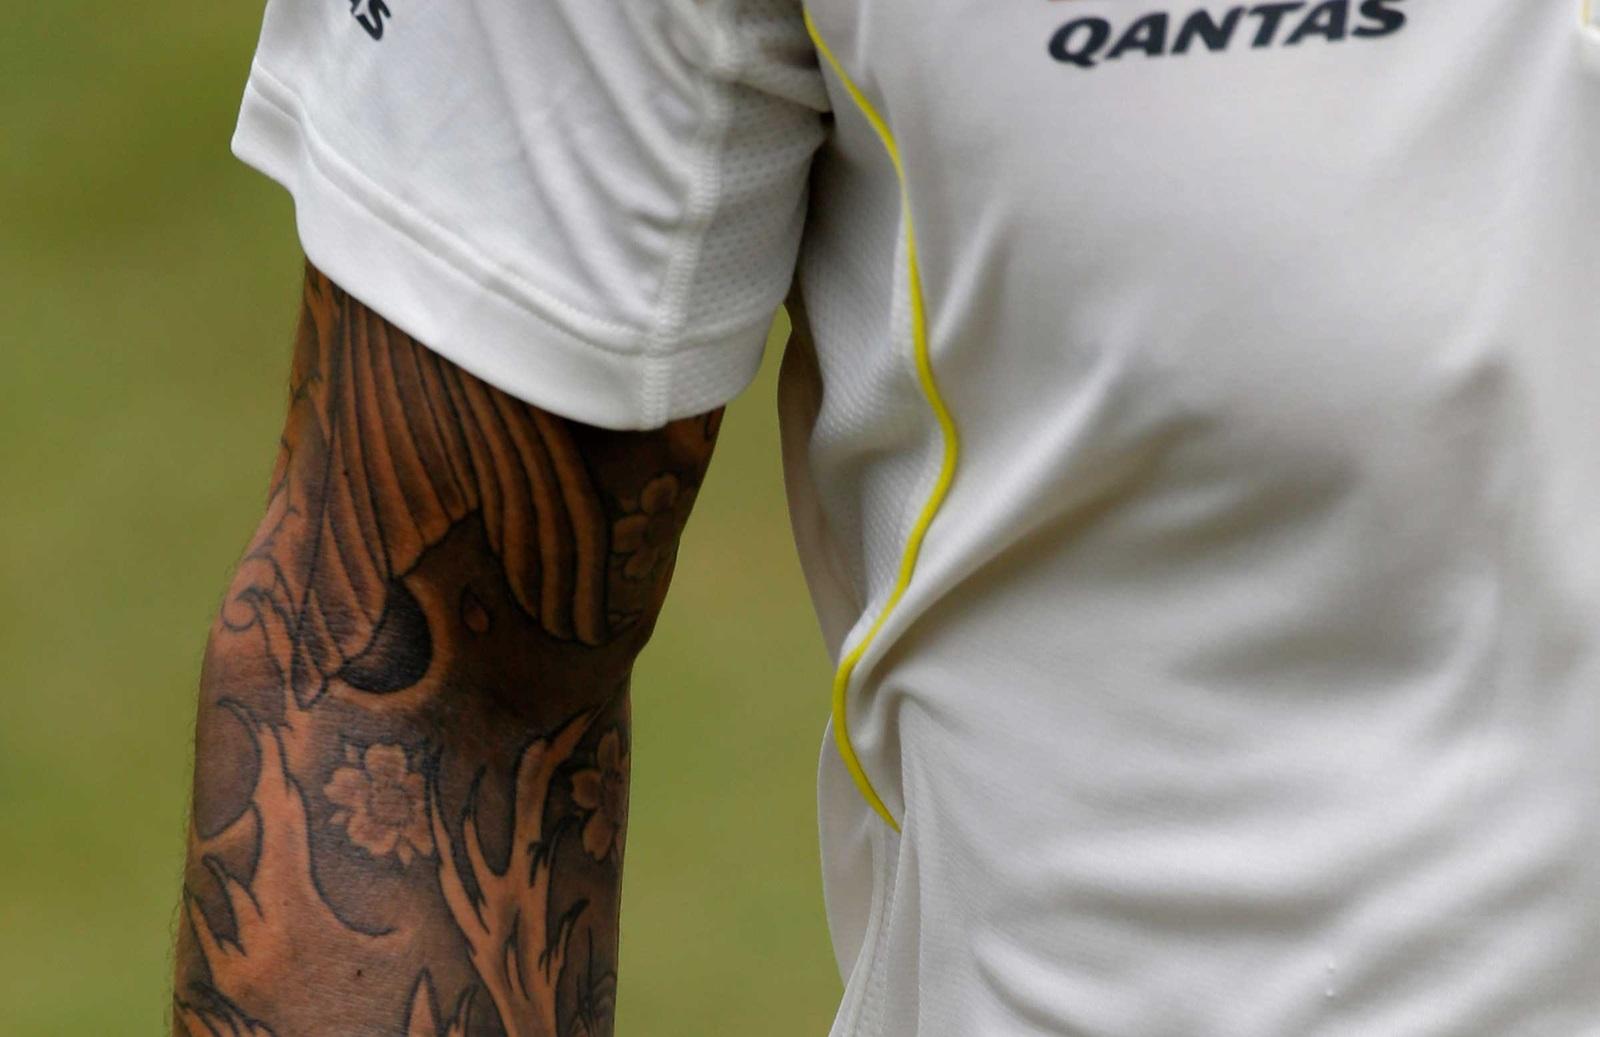 e832eb165c042 Gallery: Cricket's best tattoo art | cricket.com.au